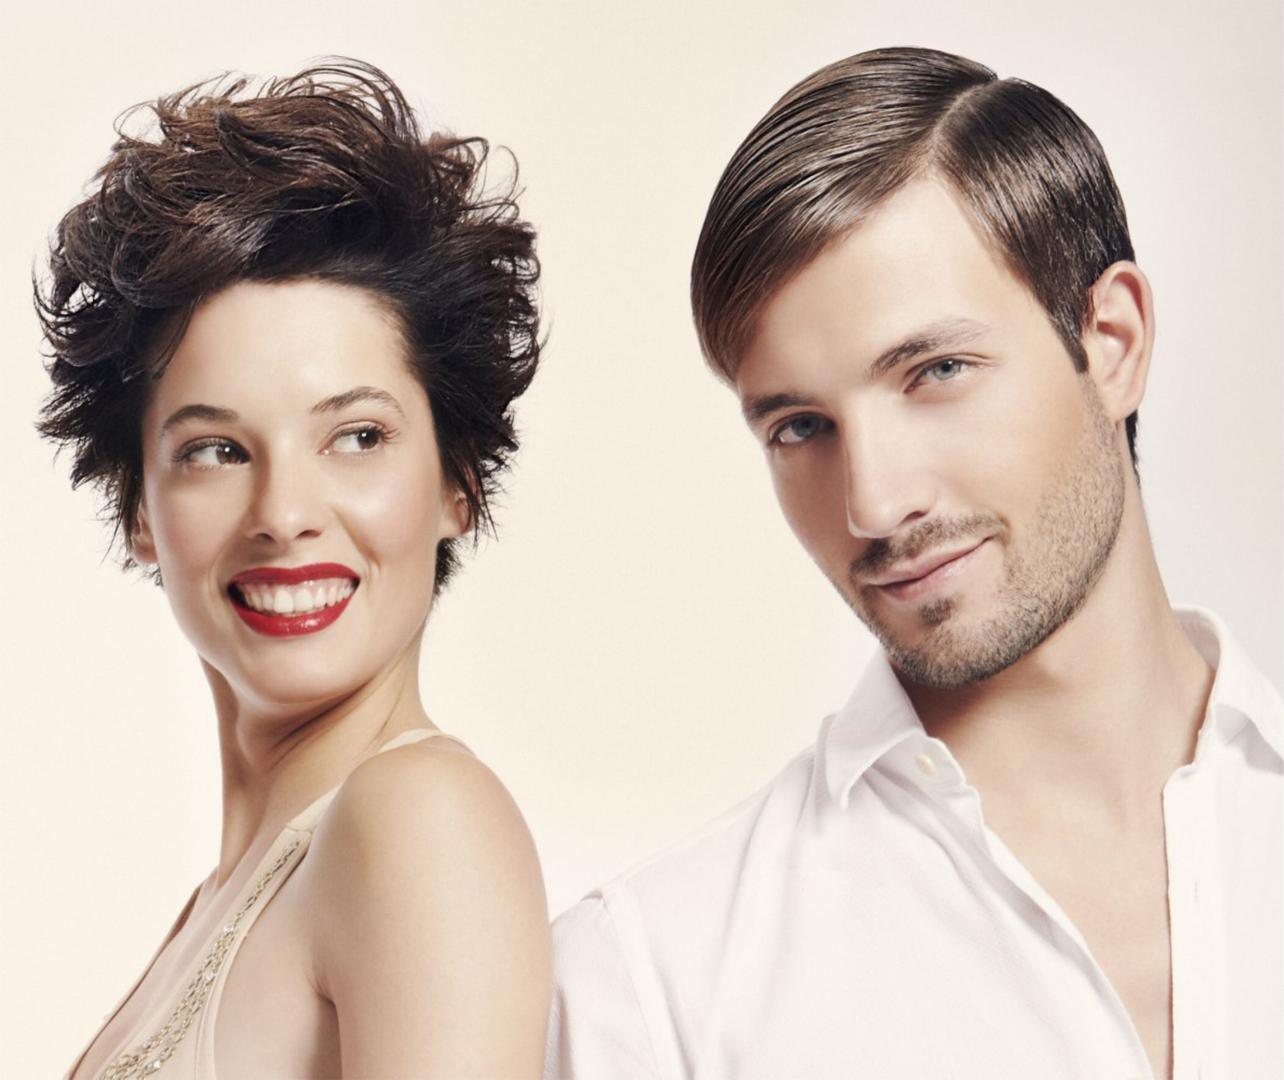 Bella Couture Salon & Day Spa - Salon/Spa, Hair Facials Massage